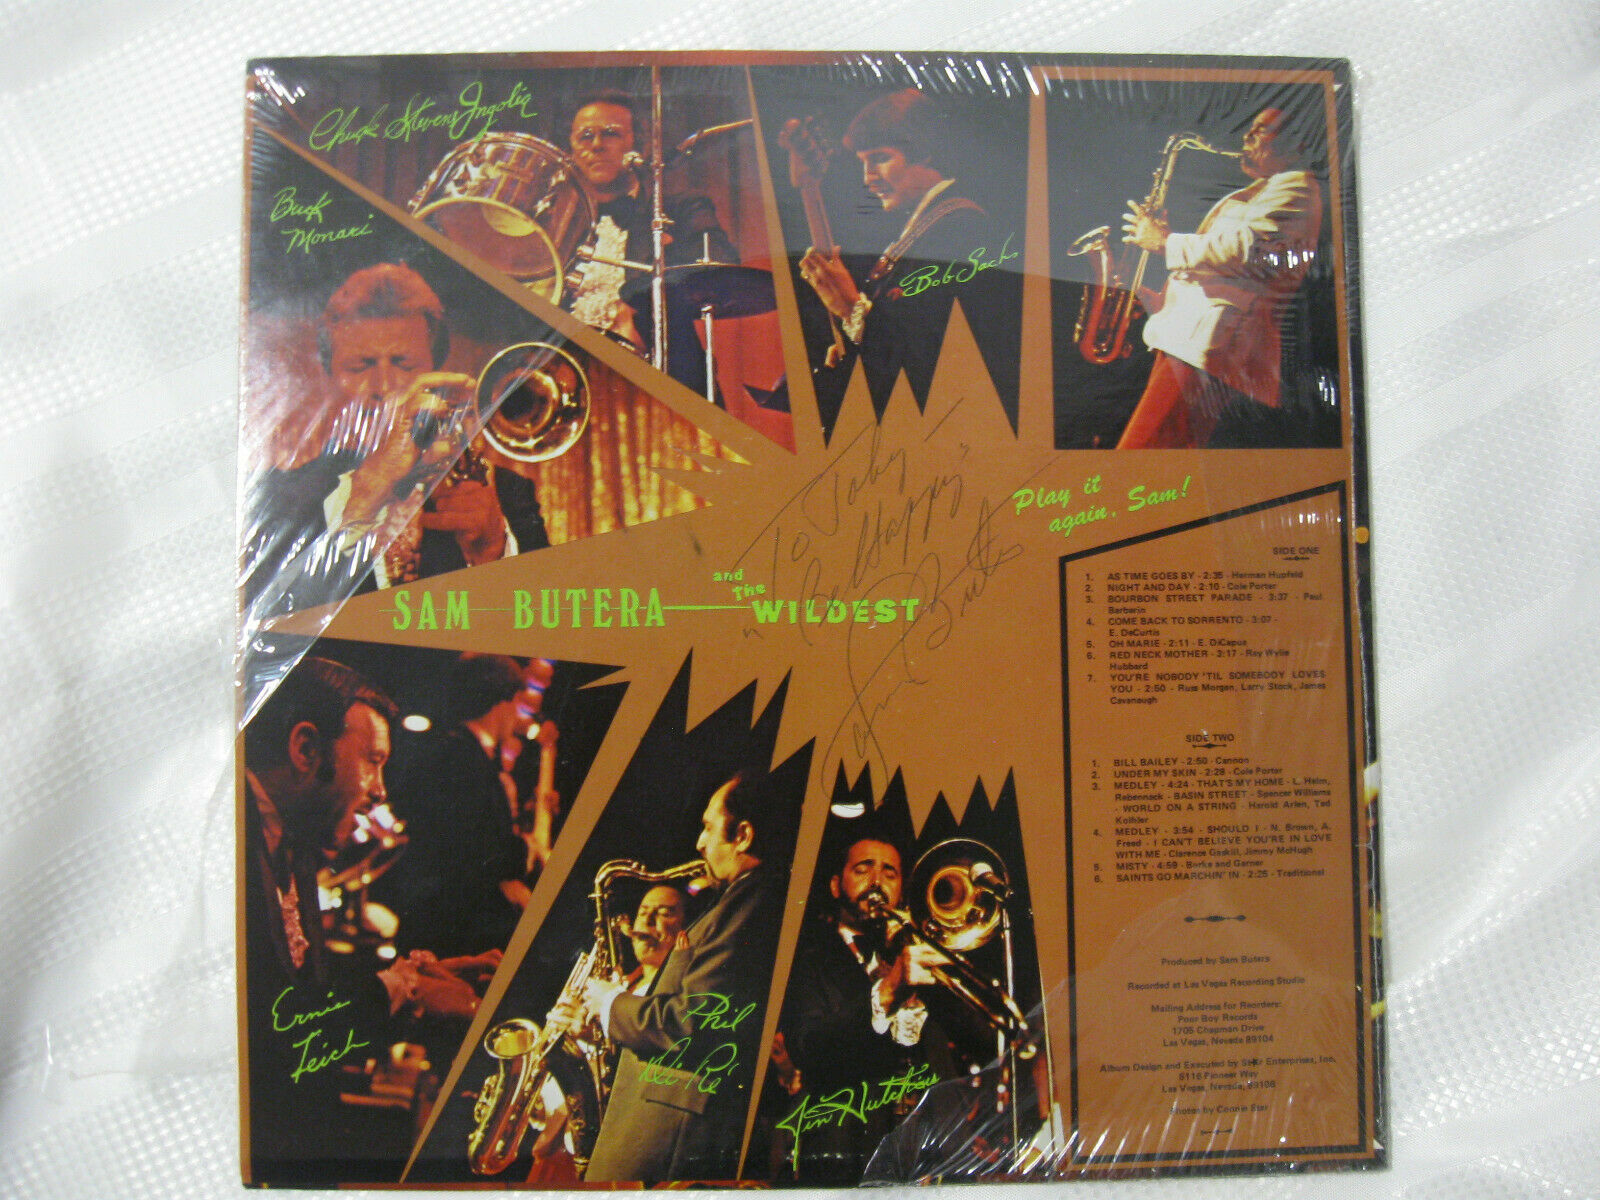 Sam Butera Play It Again Poor Boy PB1002 Vinyl Record Sealed LP SIGNED Toby image 2